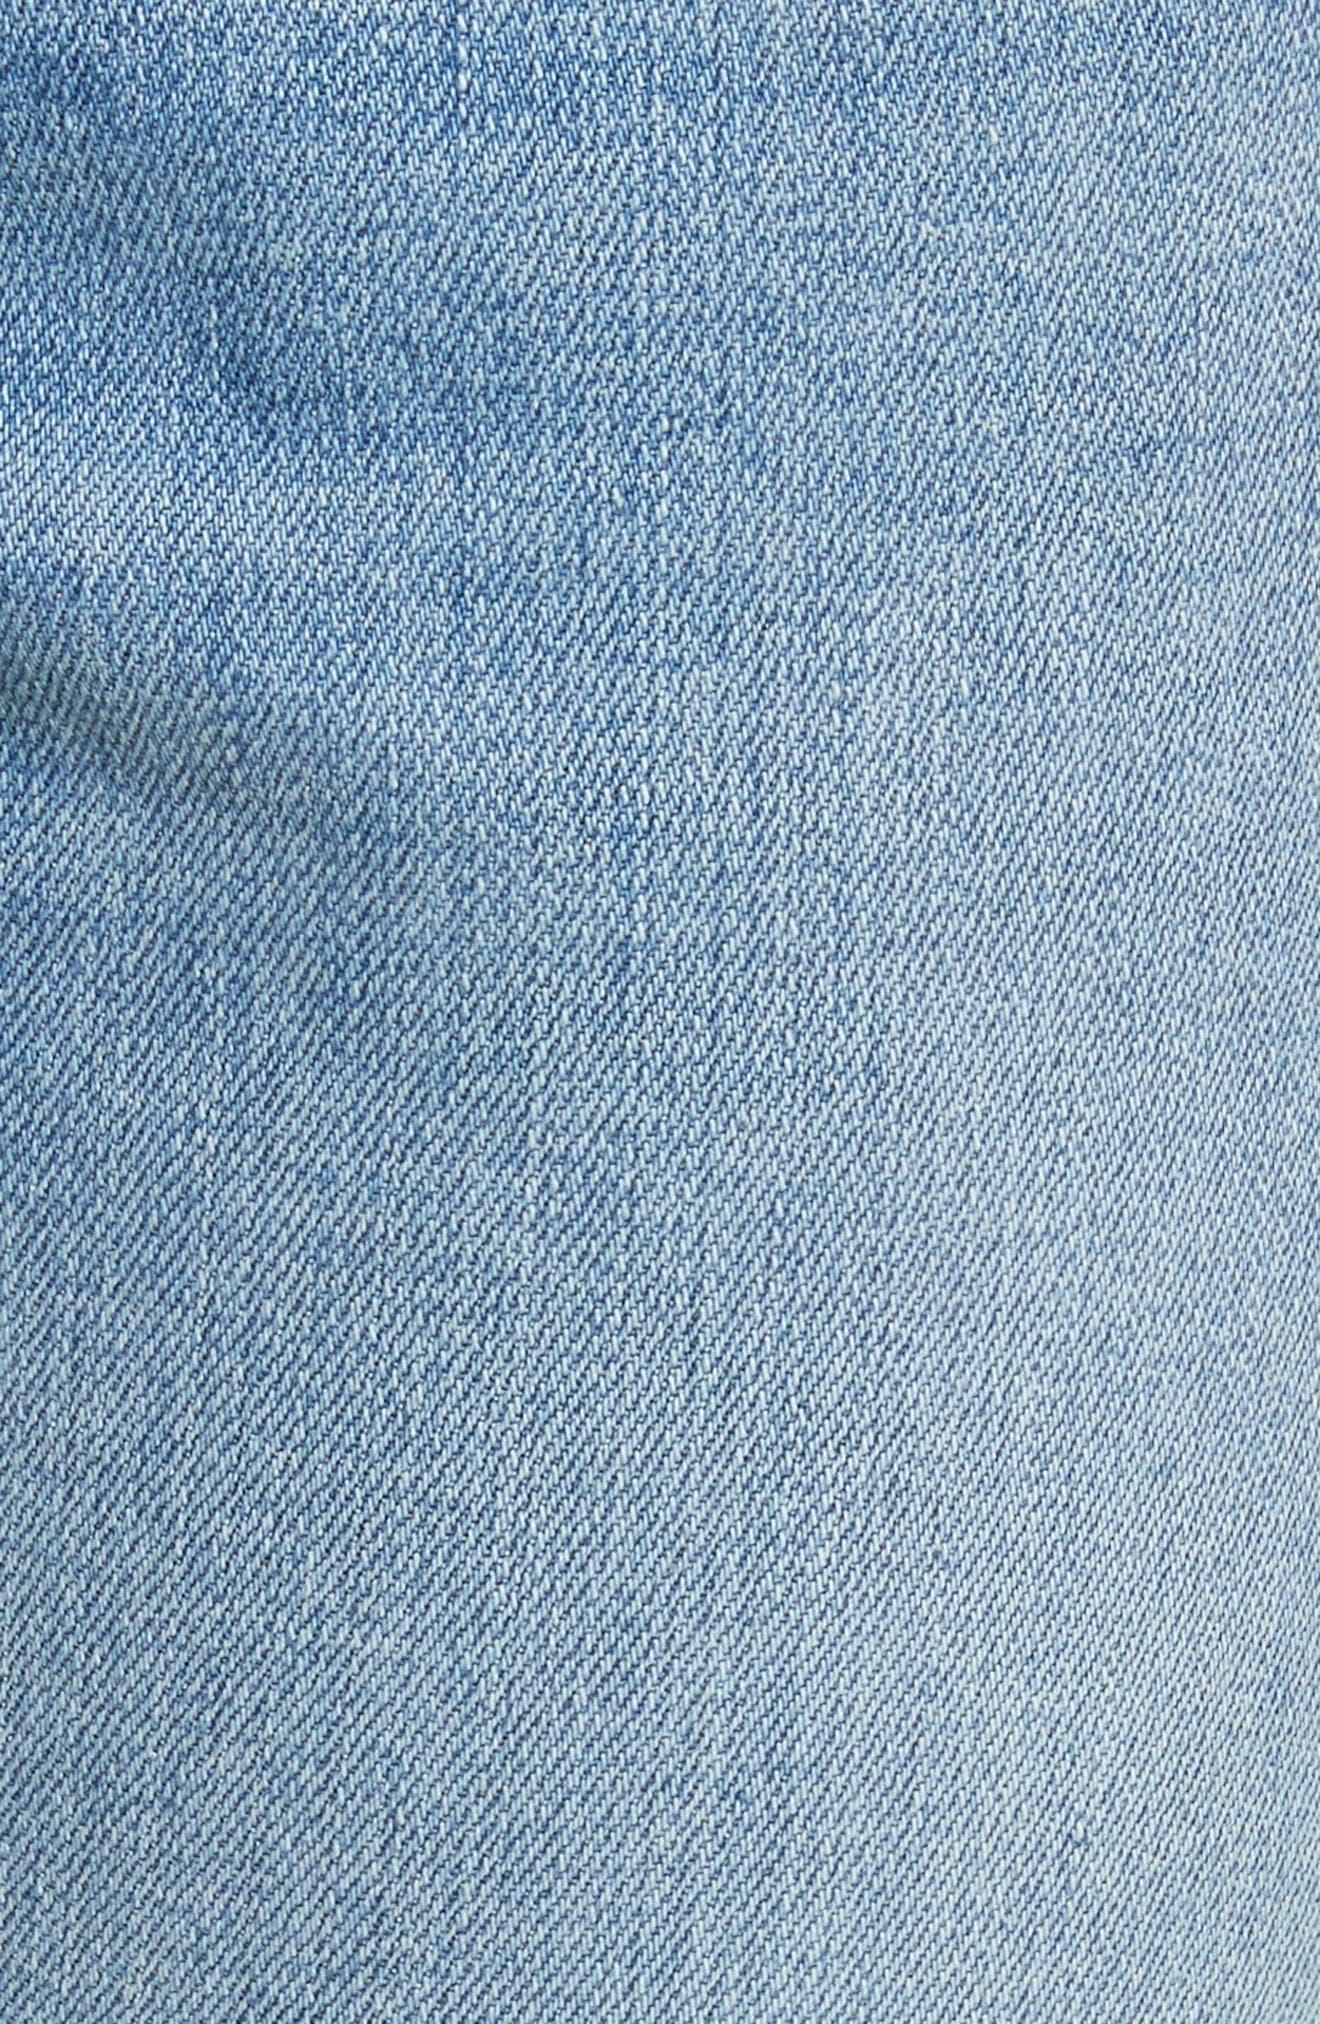 Alternate Image 5  - rag & bone/JEAN The Dre Released Hem Slim Boyfriend Jeans (Rove)